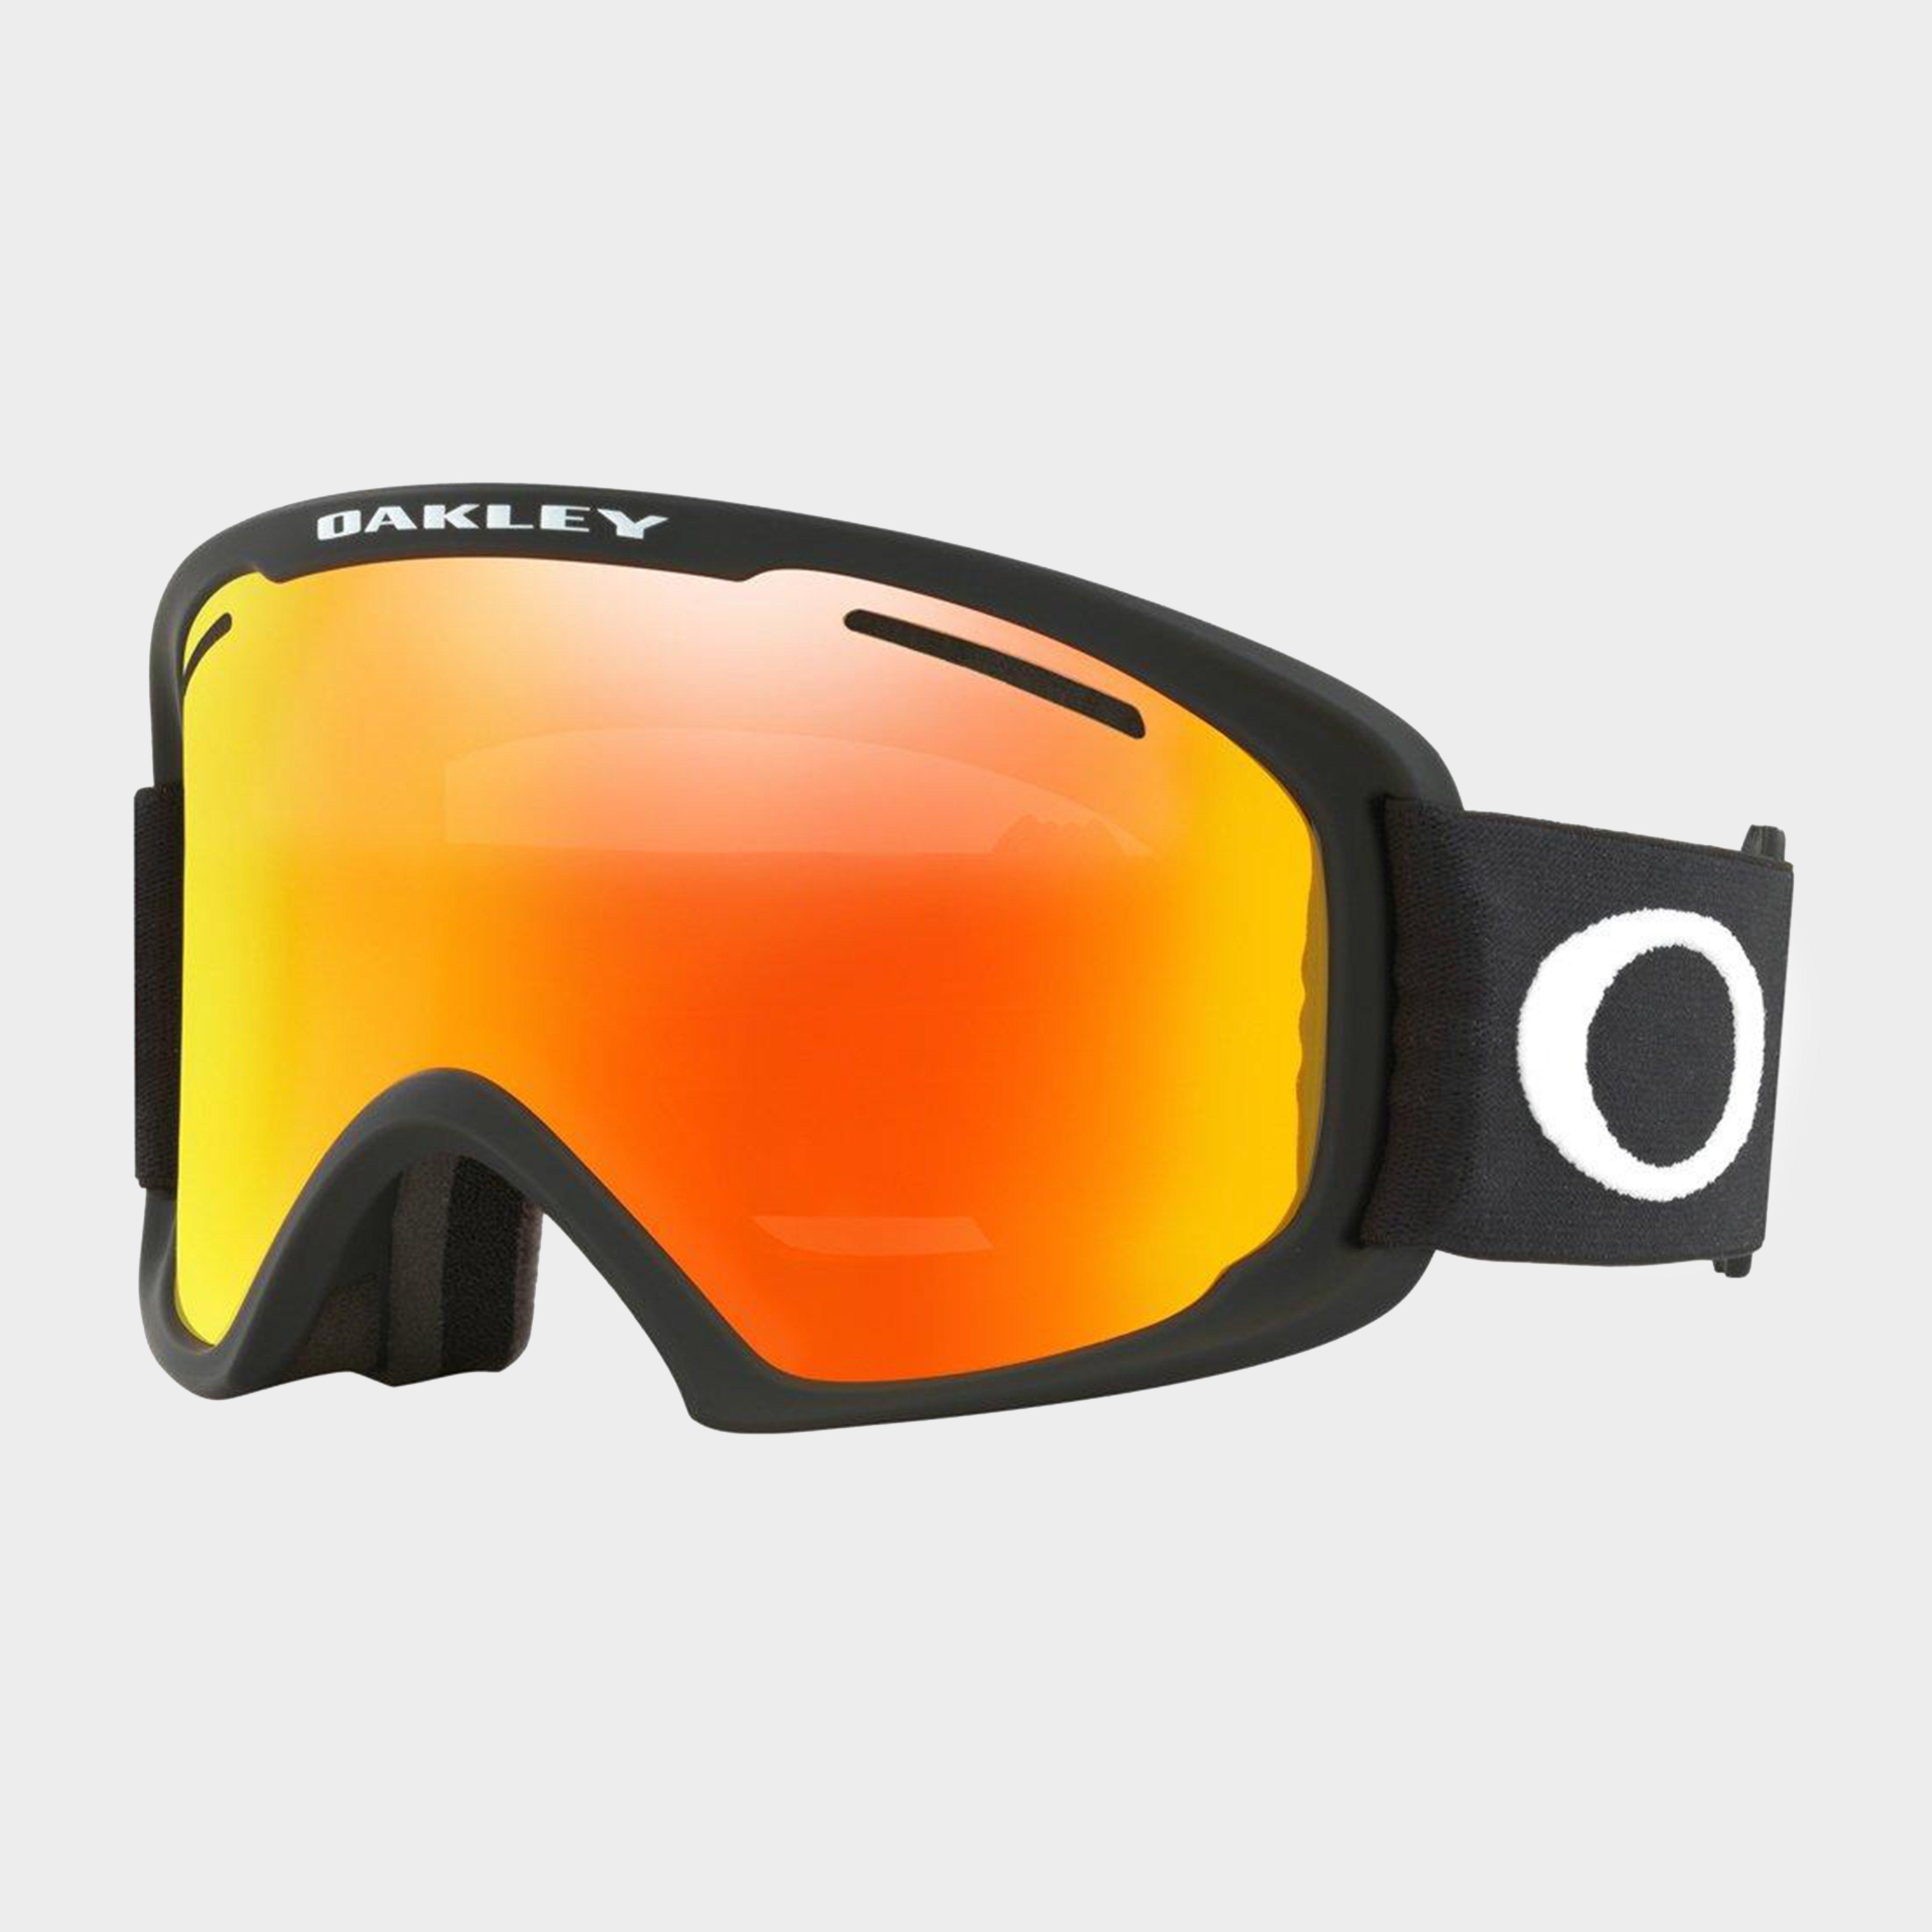 Oakley O Frame 2.0 PRO XL Snow Goggles, BLK/BLK